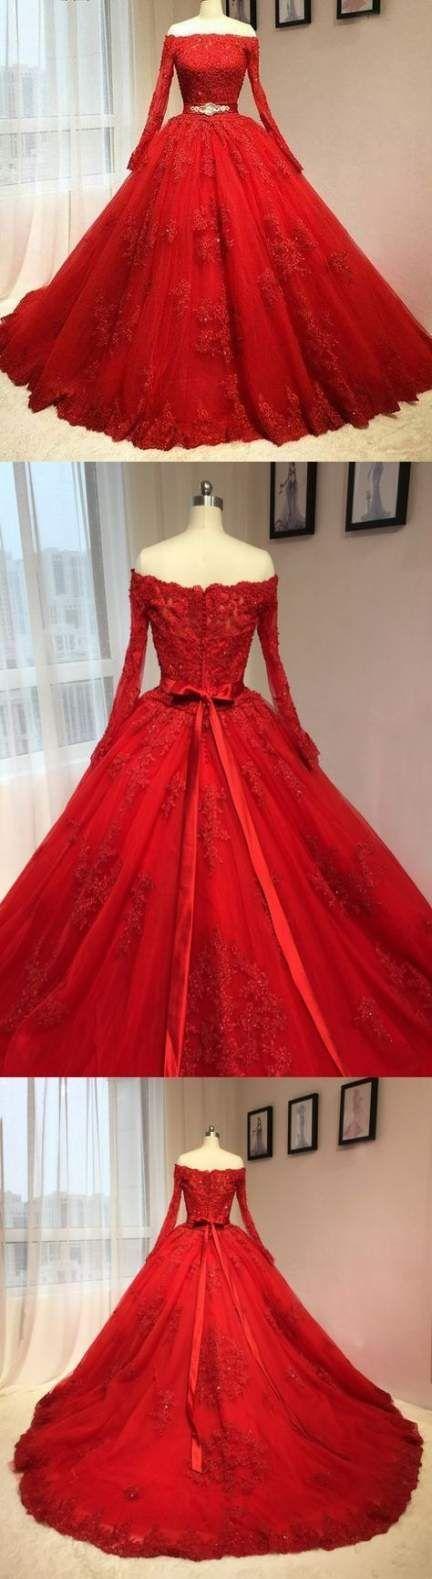 Super Make Up Abschlussball Roten Kleid Langarm 62 Ideen Beautyblog Makeupoftheday Mak Ballkleider Lange Armel Langarmliges Kleid Rotes Kleid